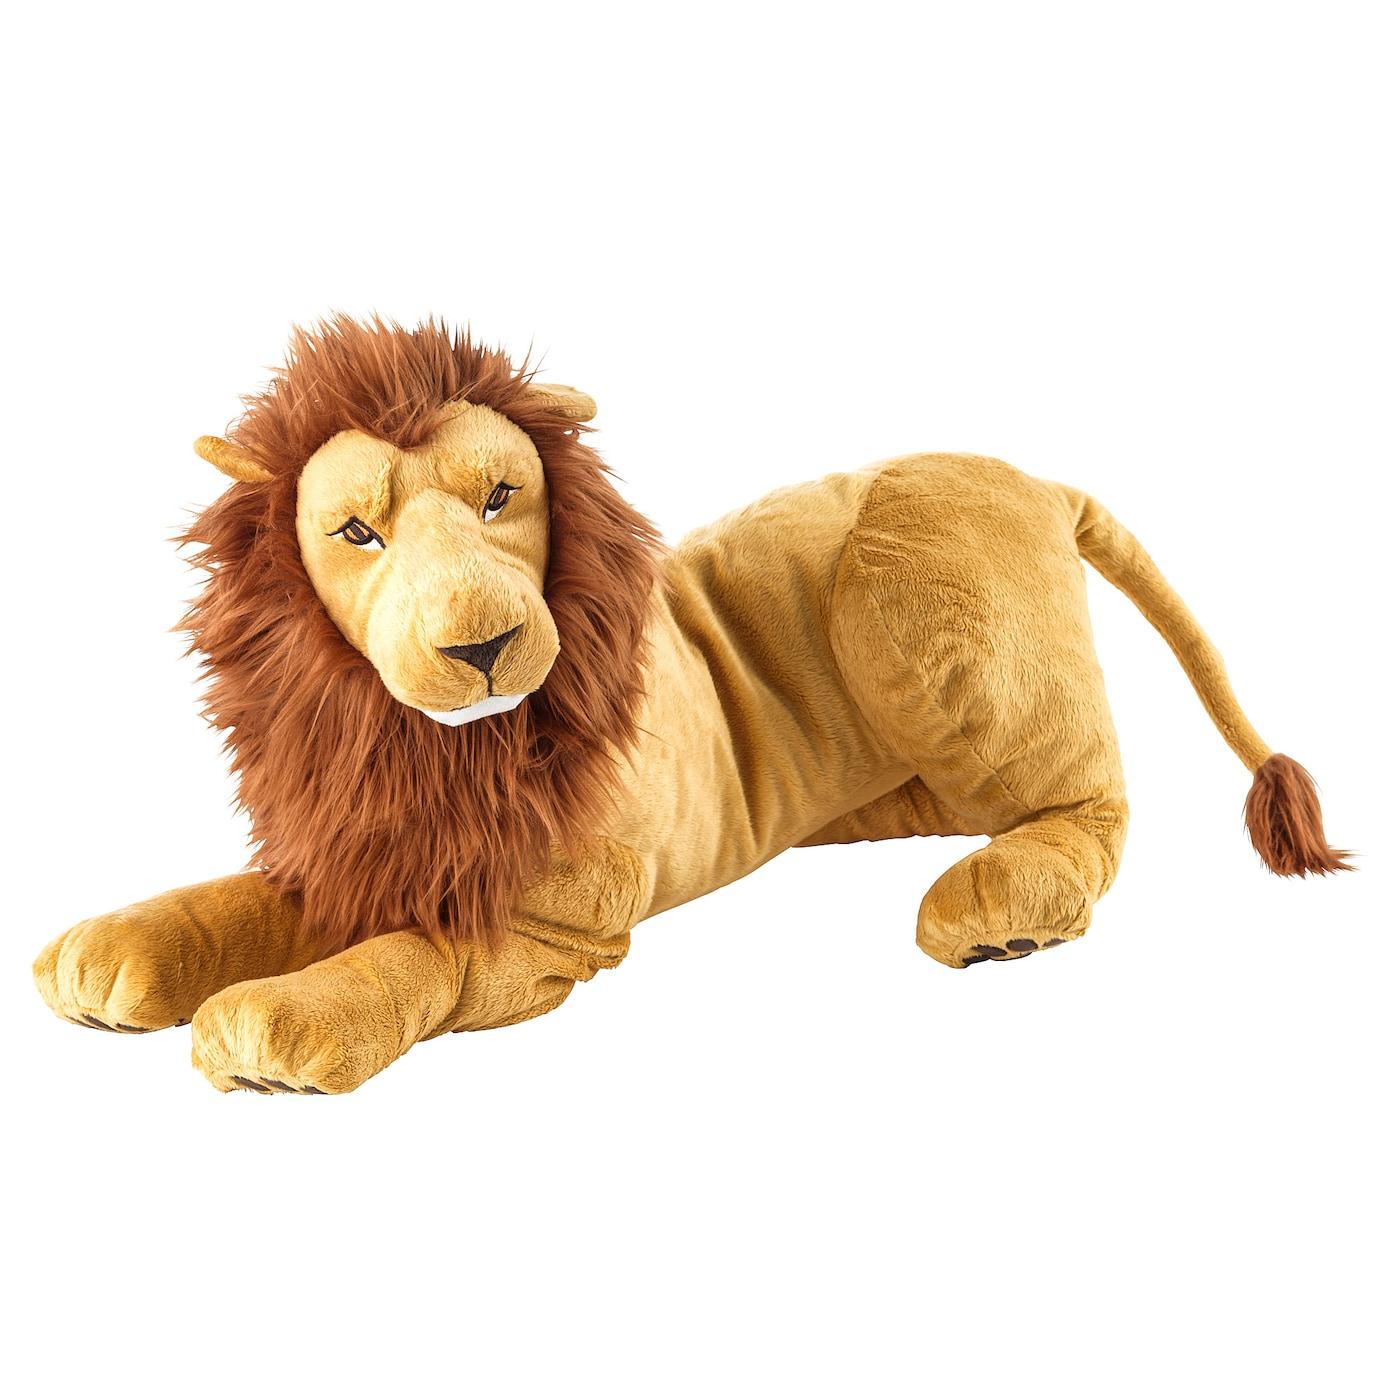 Scary Squeeze Stuffed Animals, Djungelskog Lion Soft Toy Ikea